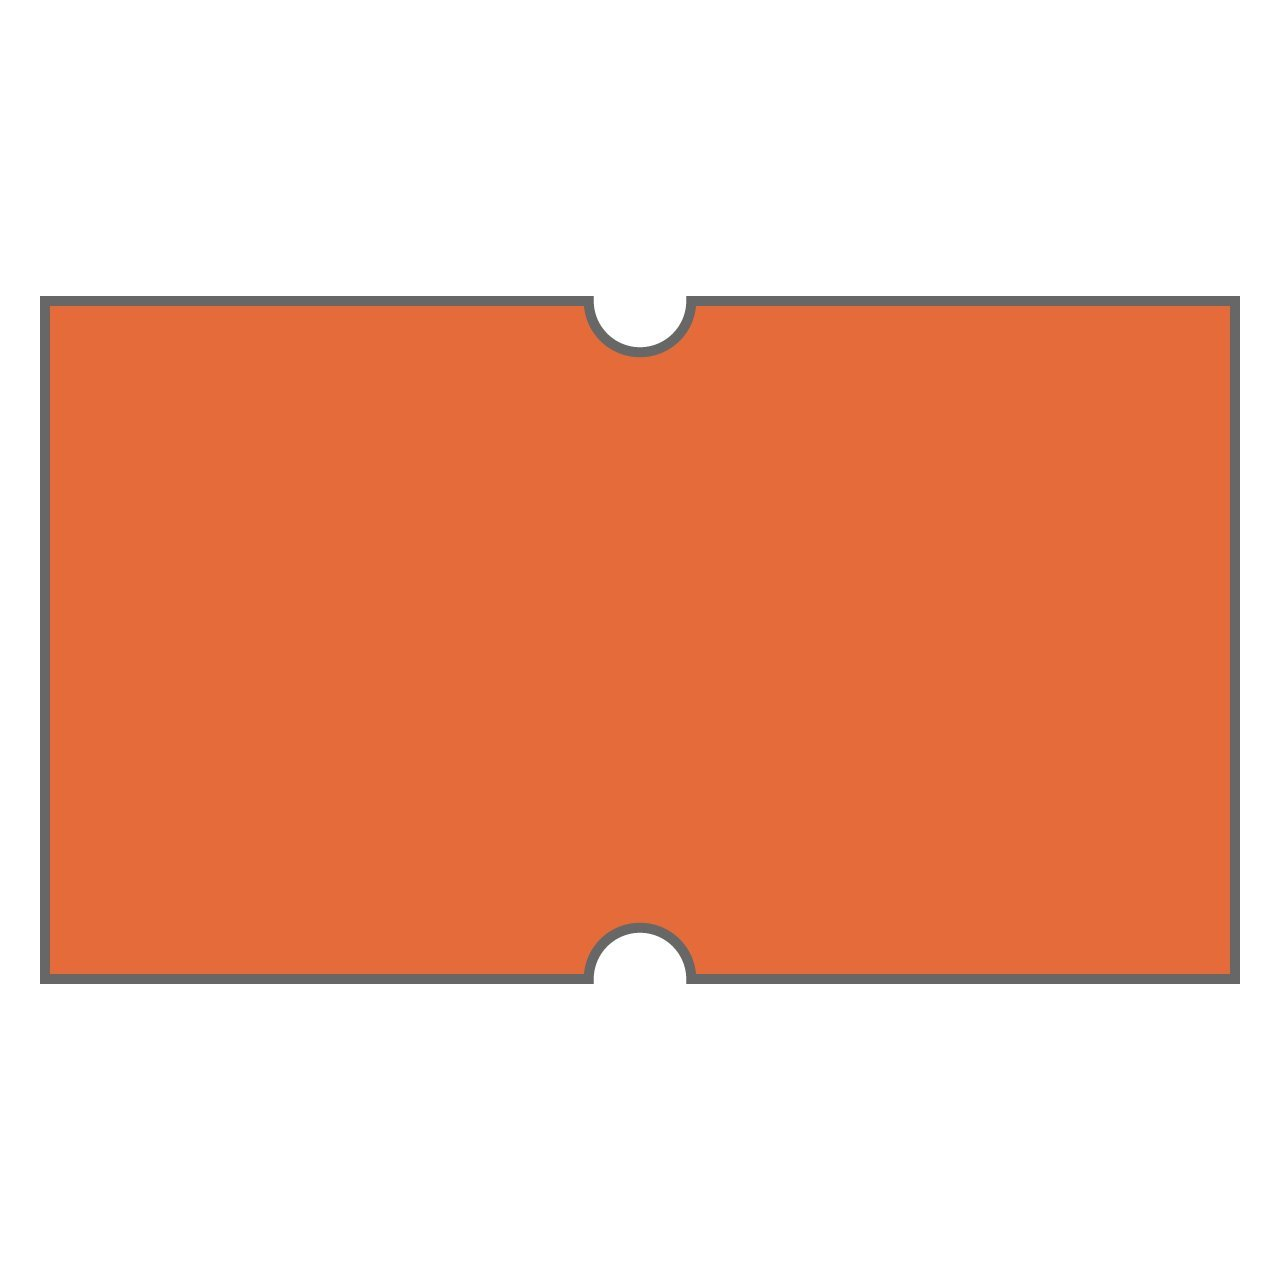 B00ZUK6VG2 DayMark I102990 DuraMark Date Coder Blank Permanent Label, For DM3 SpeedyMark 10 1-Line Marking Gun, Florescent Red (Pack of 8 Rolls) 51vGHg6xaJL